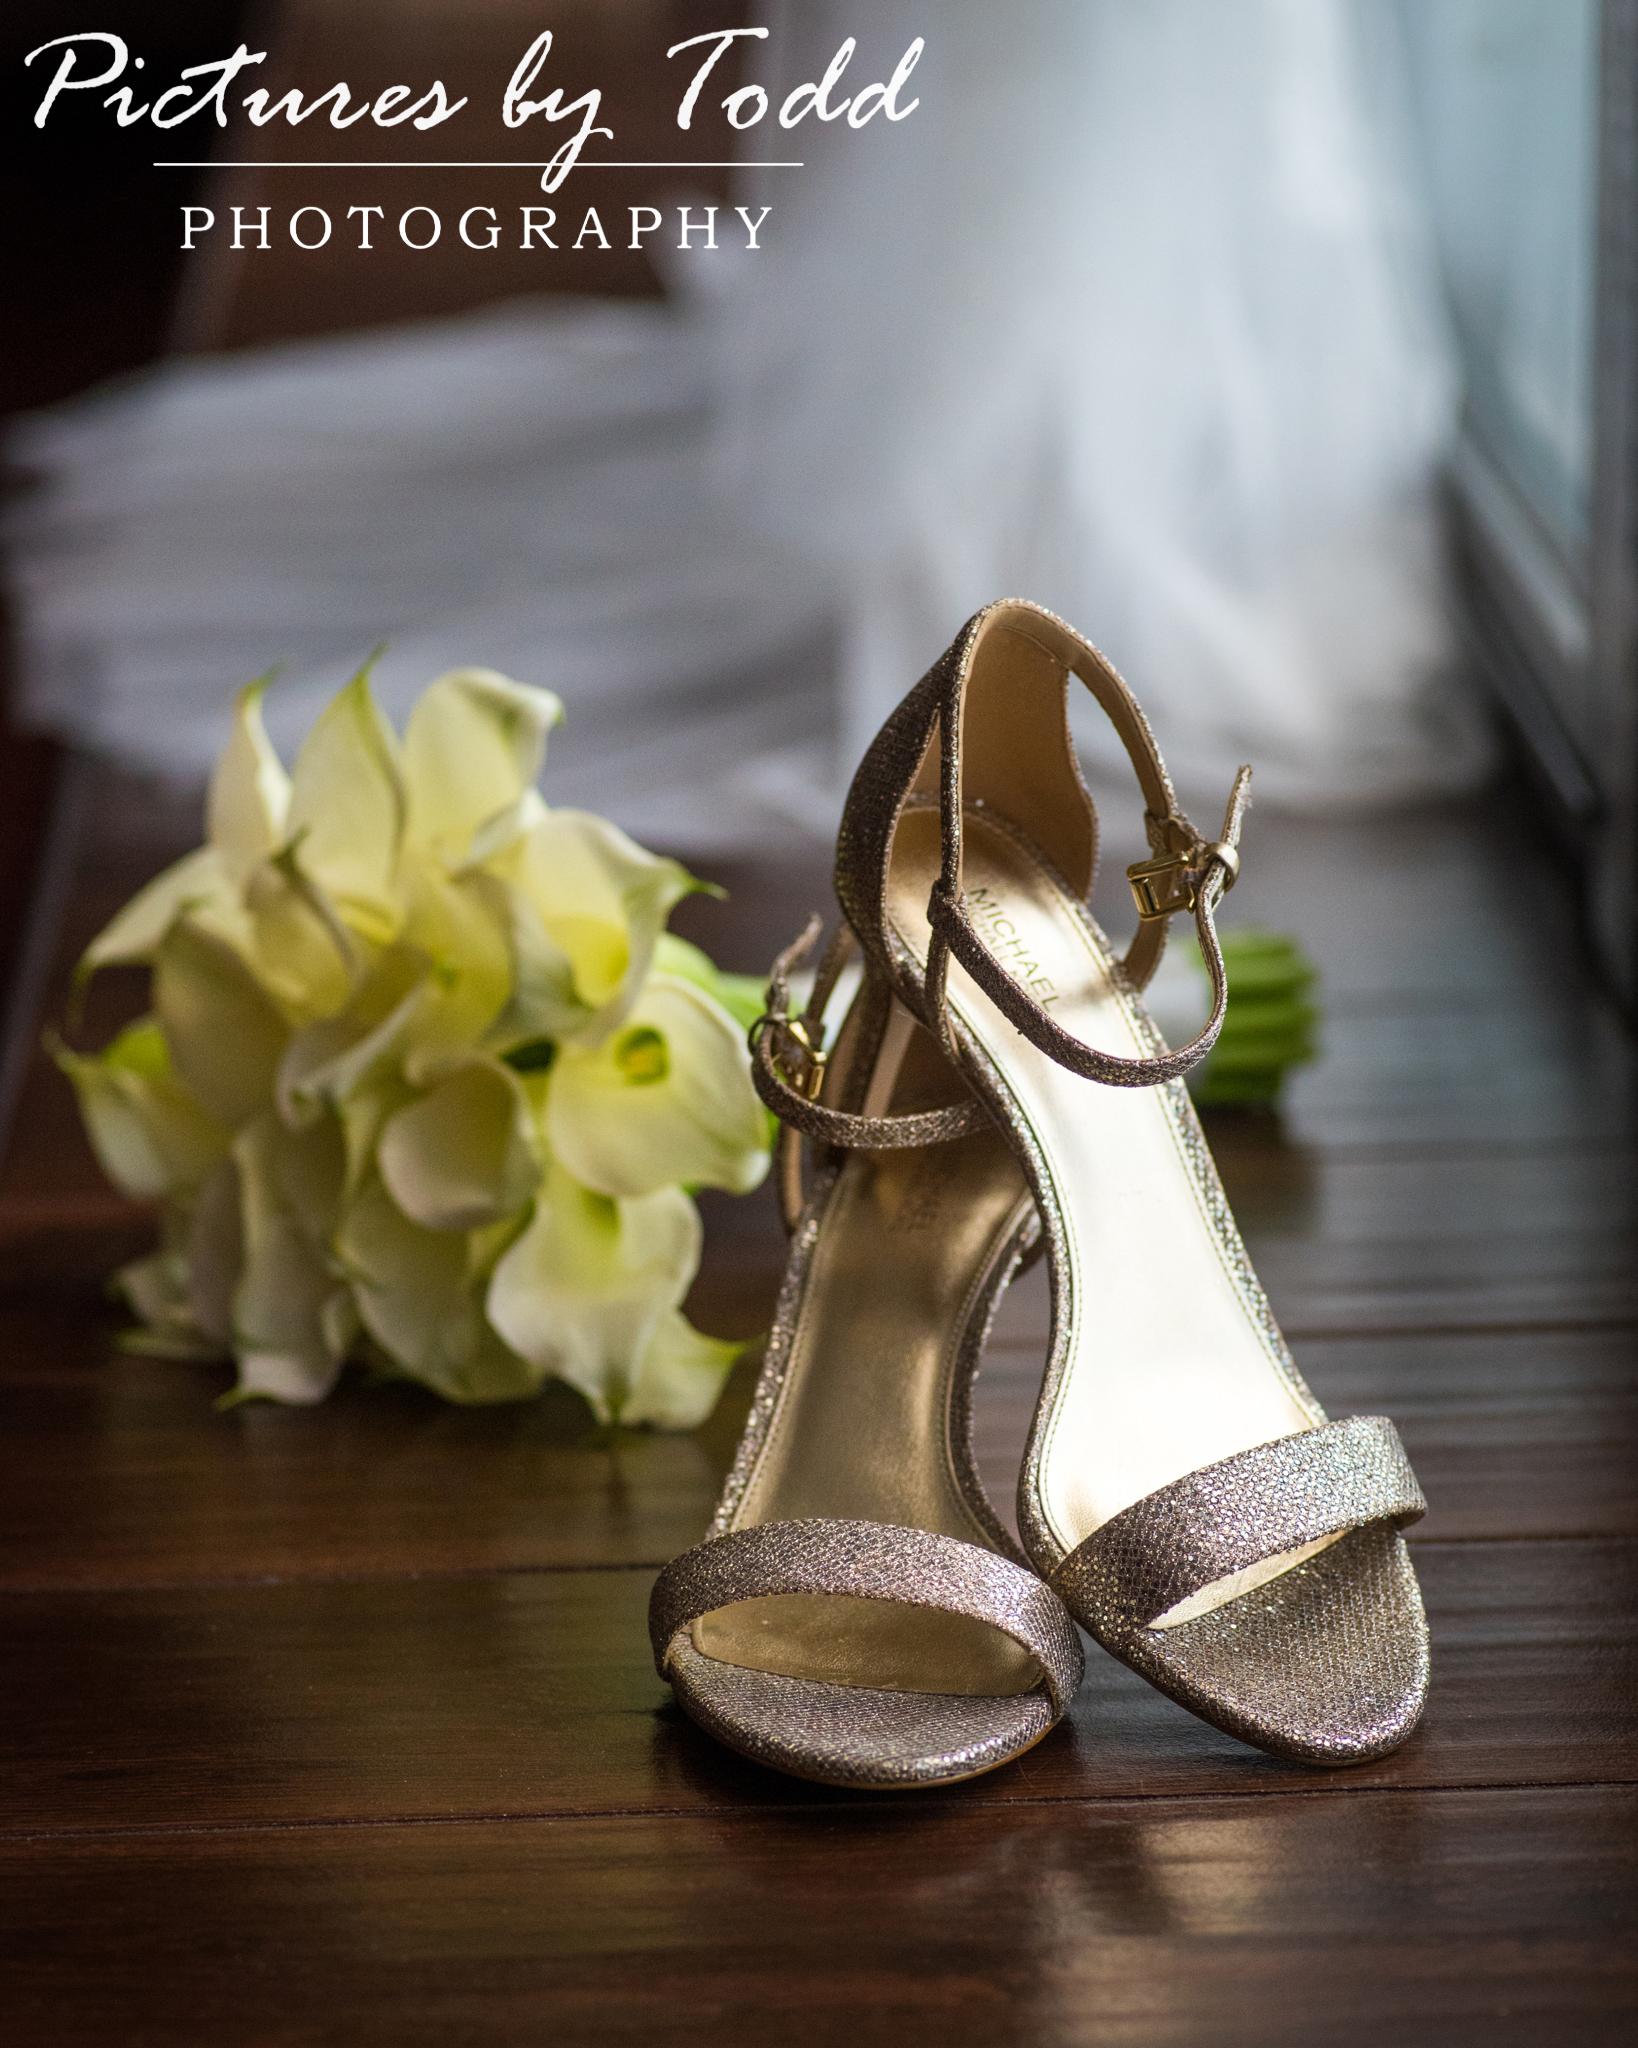 Clarks Landing Yacht Club Wedding, Arrangements Unlimited, Barcelona Band of EBE, Marina Wedding, Dibartolo Bakery, Delran, 08075